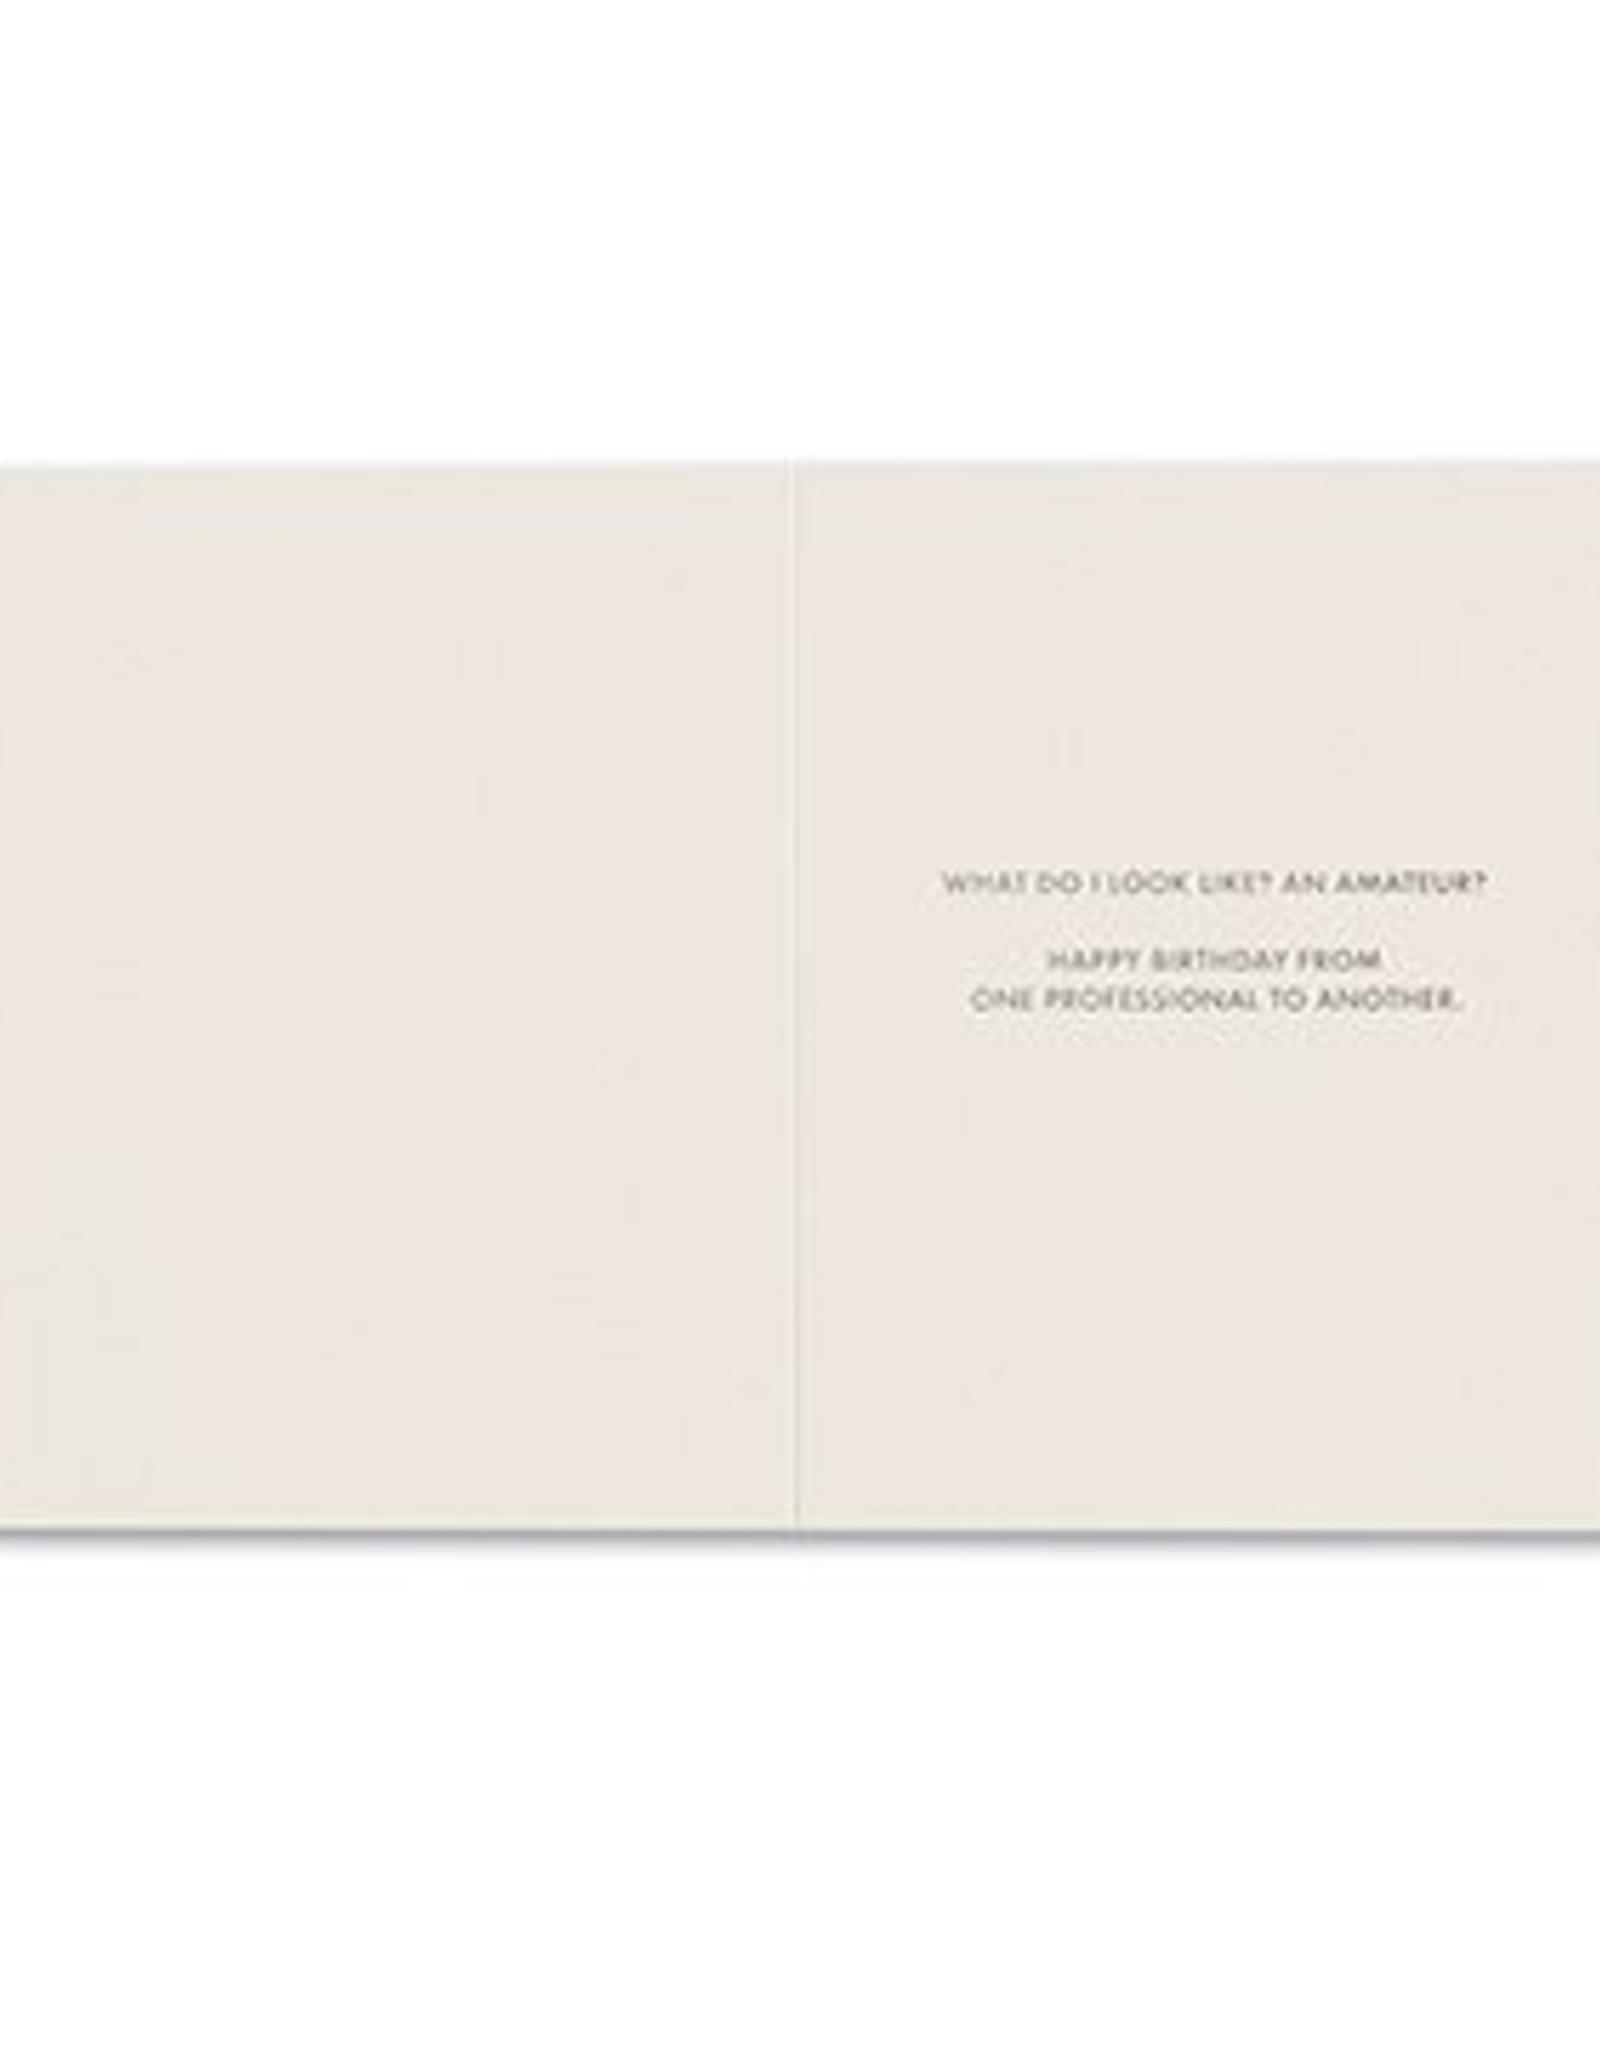 Frank & Funny Birthday Card- 6212